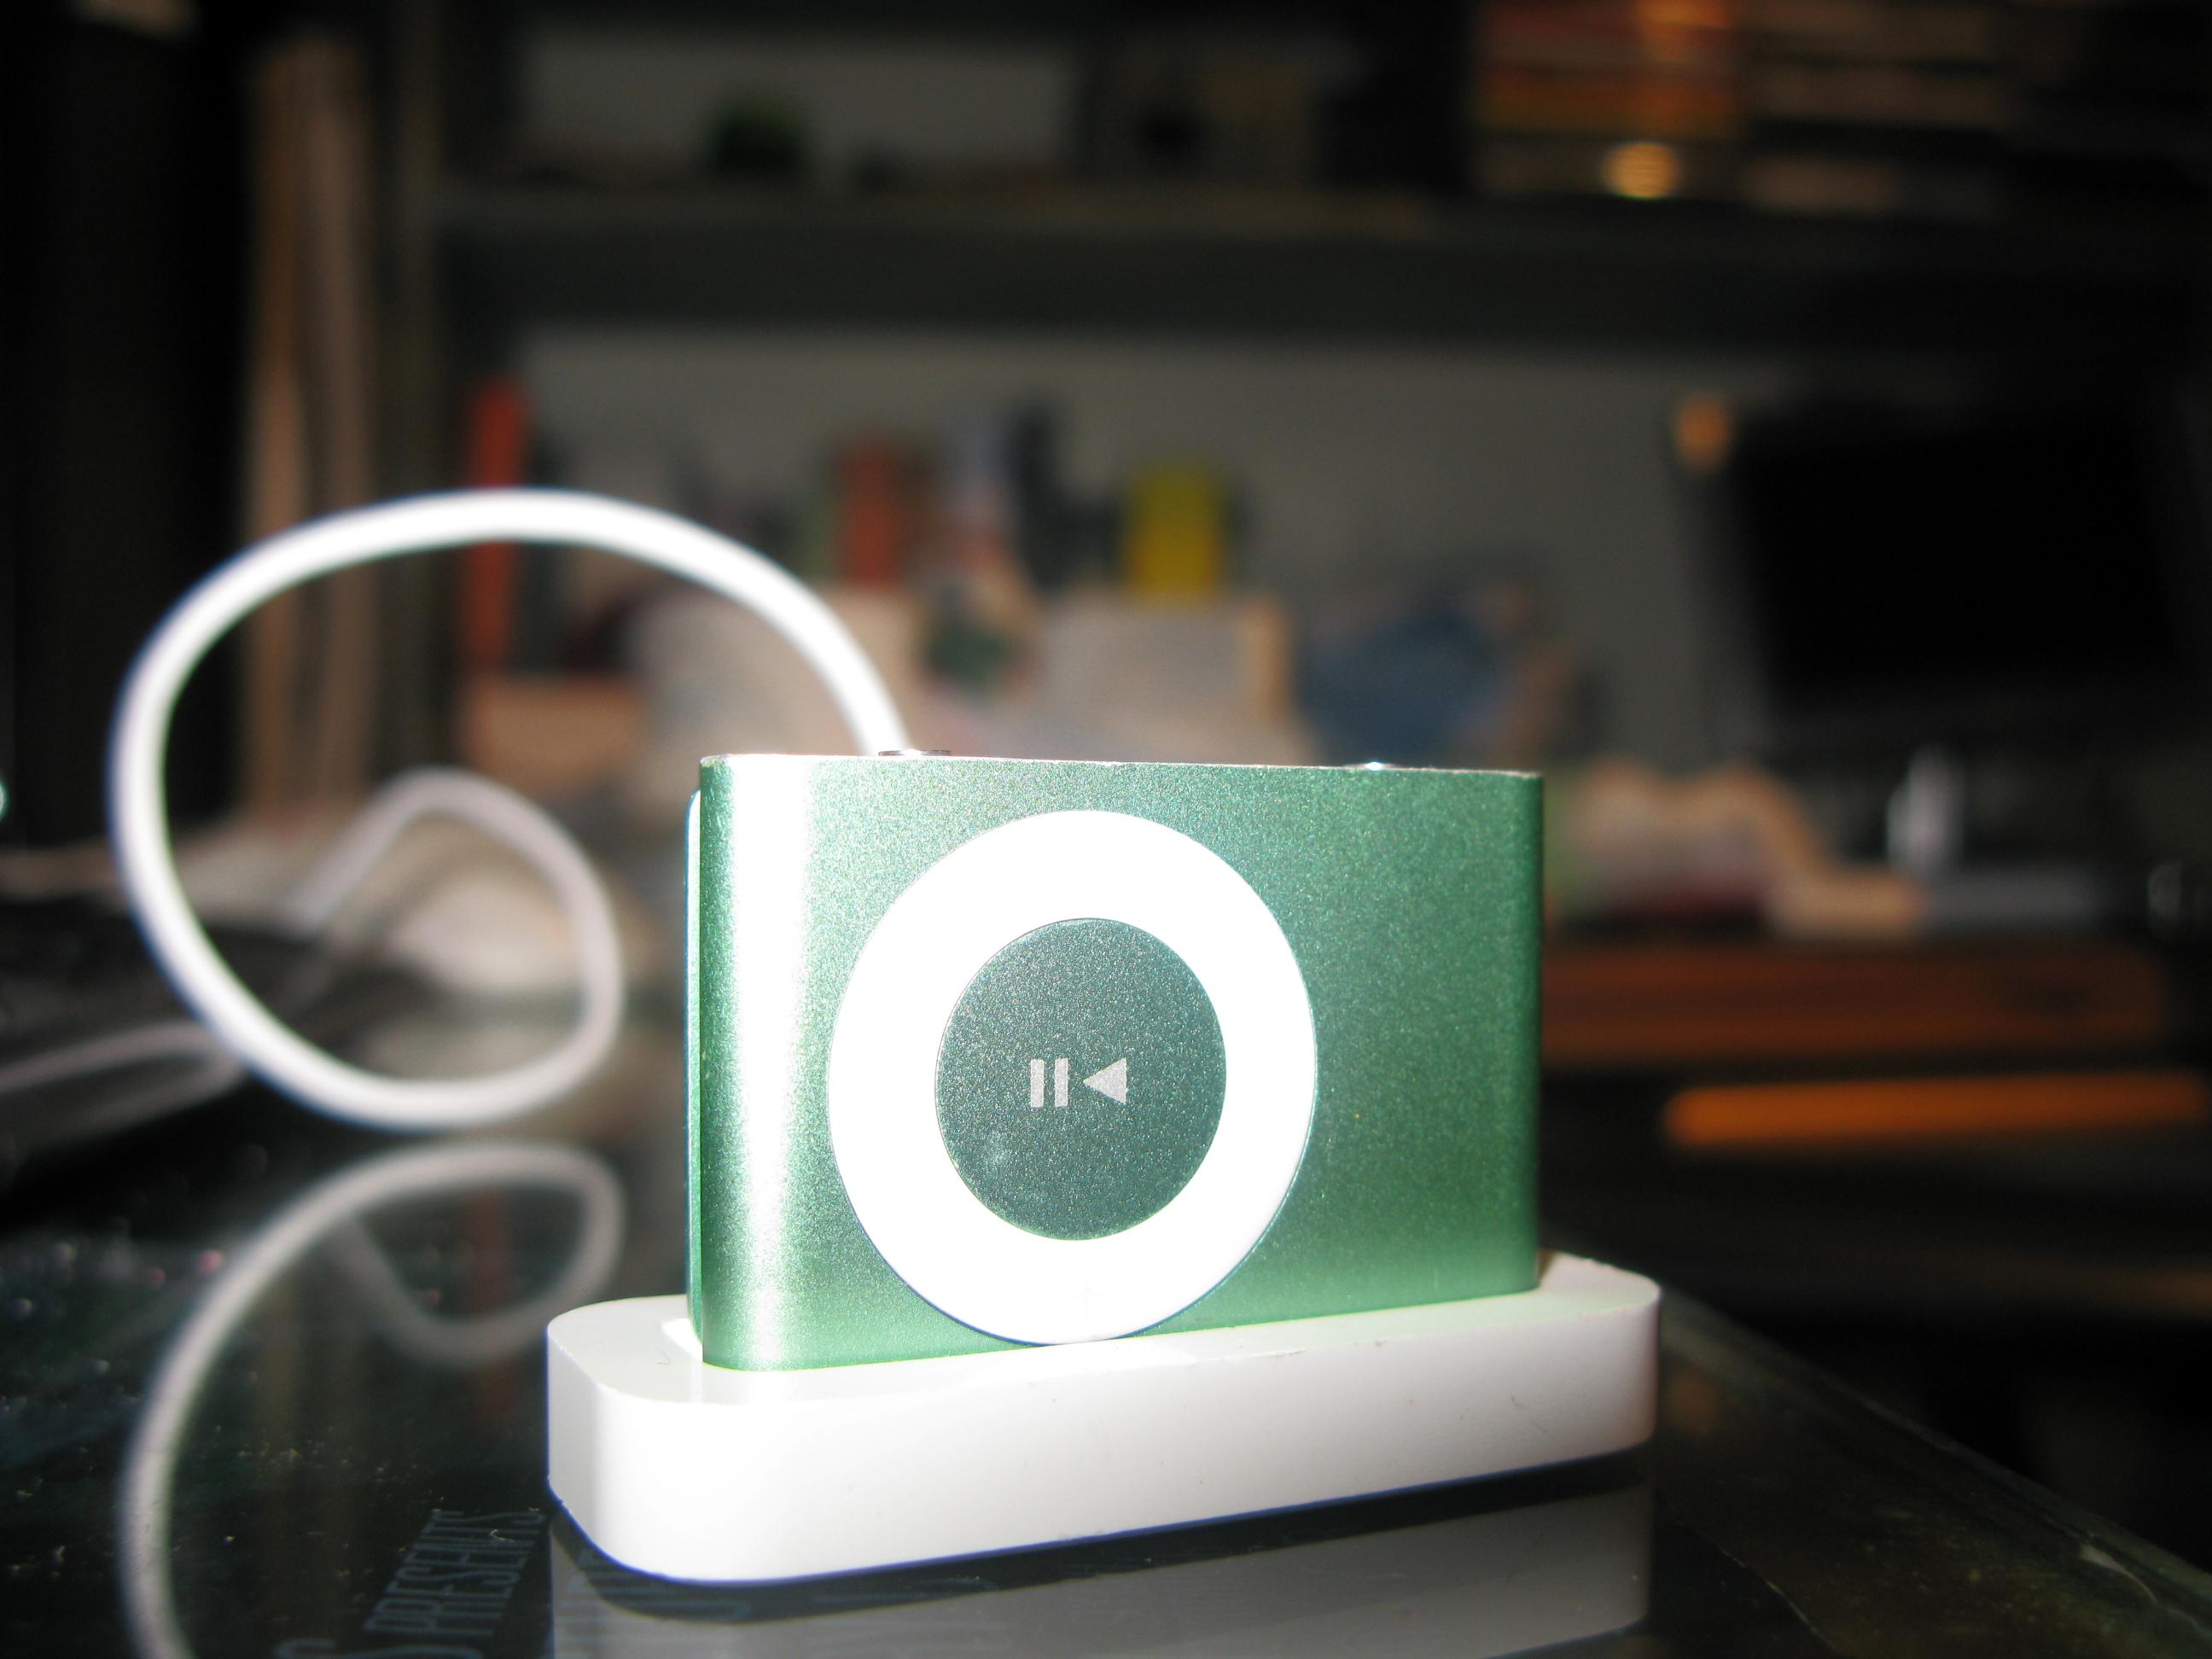 File:Ipod Shuffle.JPG - Wikimedia Commons